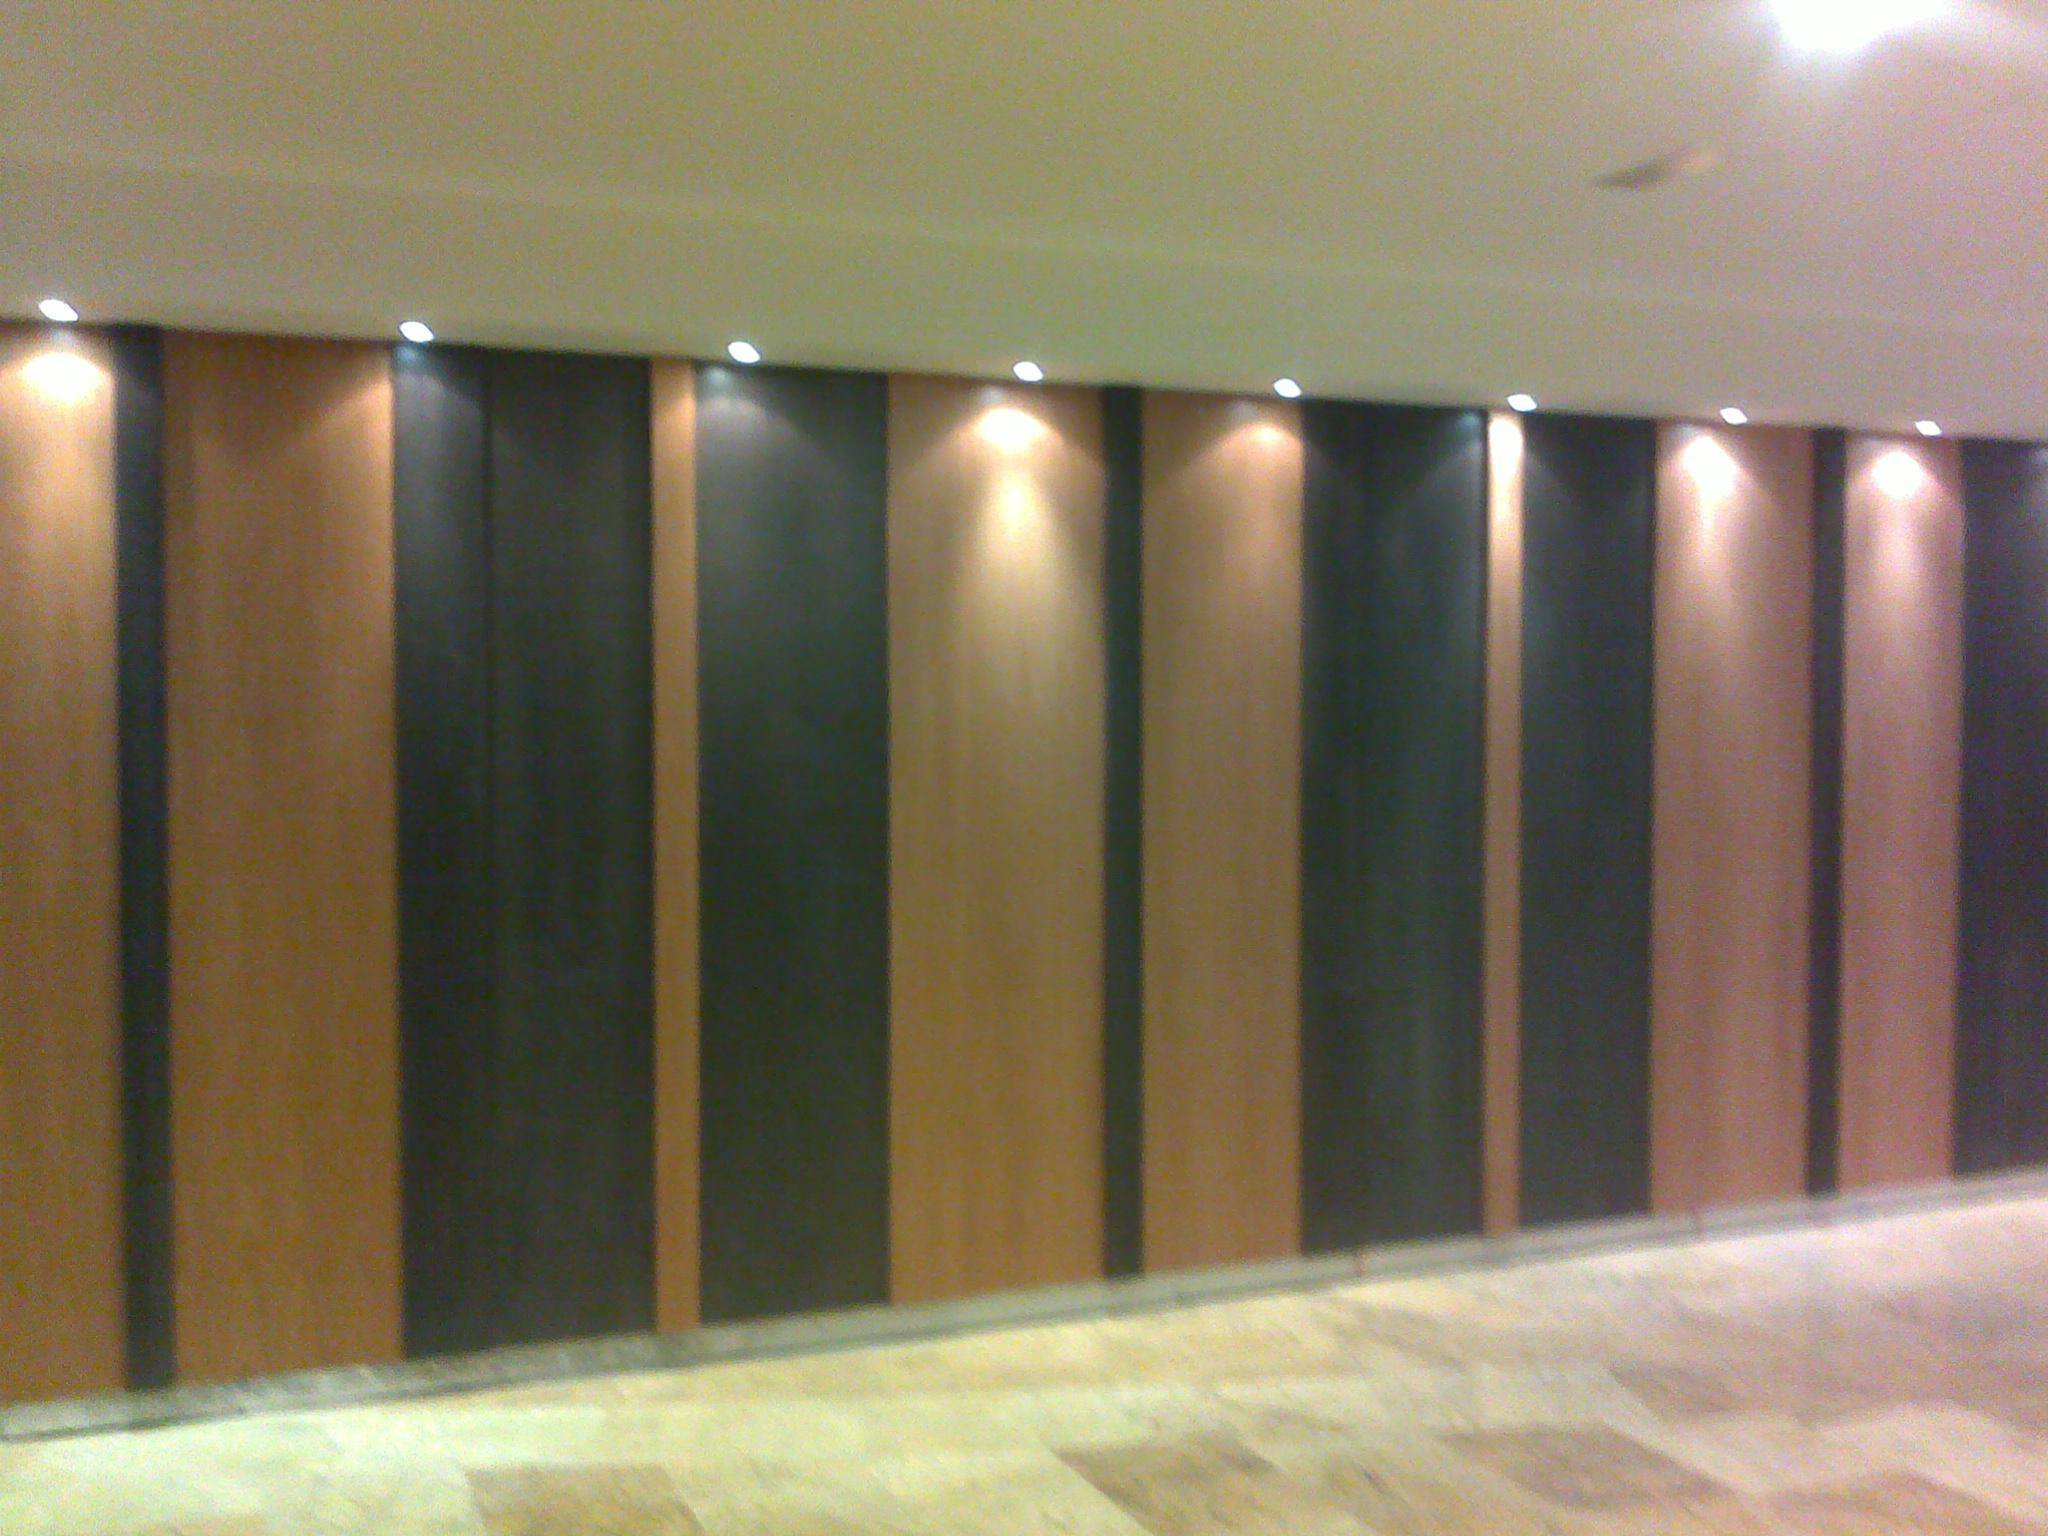 Panelado De Madera En Forma De Acordeon Carpinteria Movidecor Granada - Panelado-madera